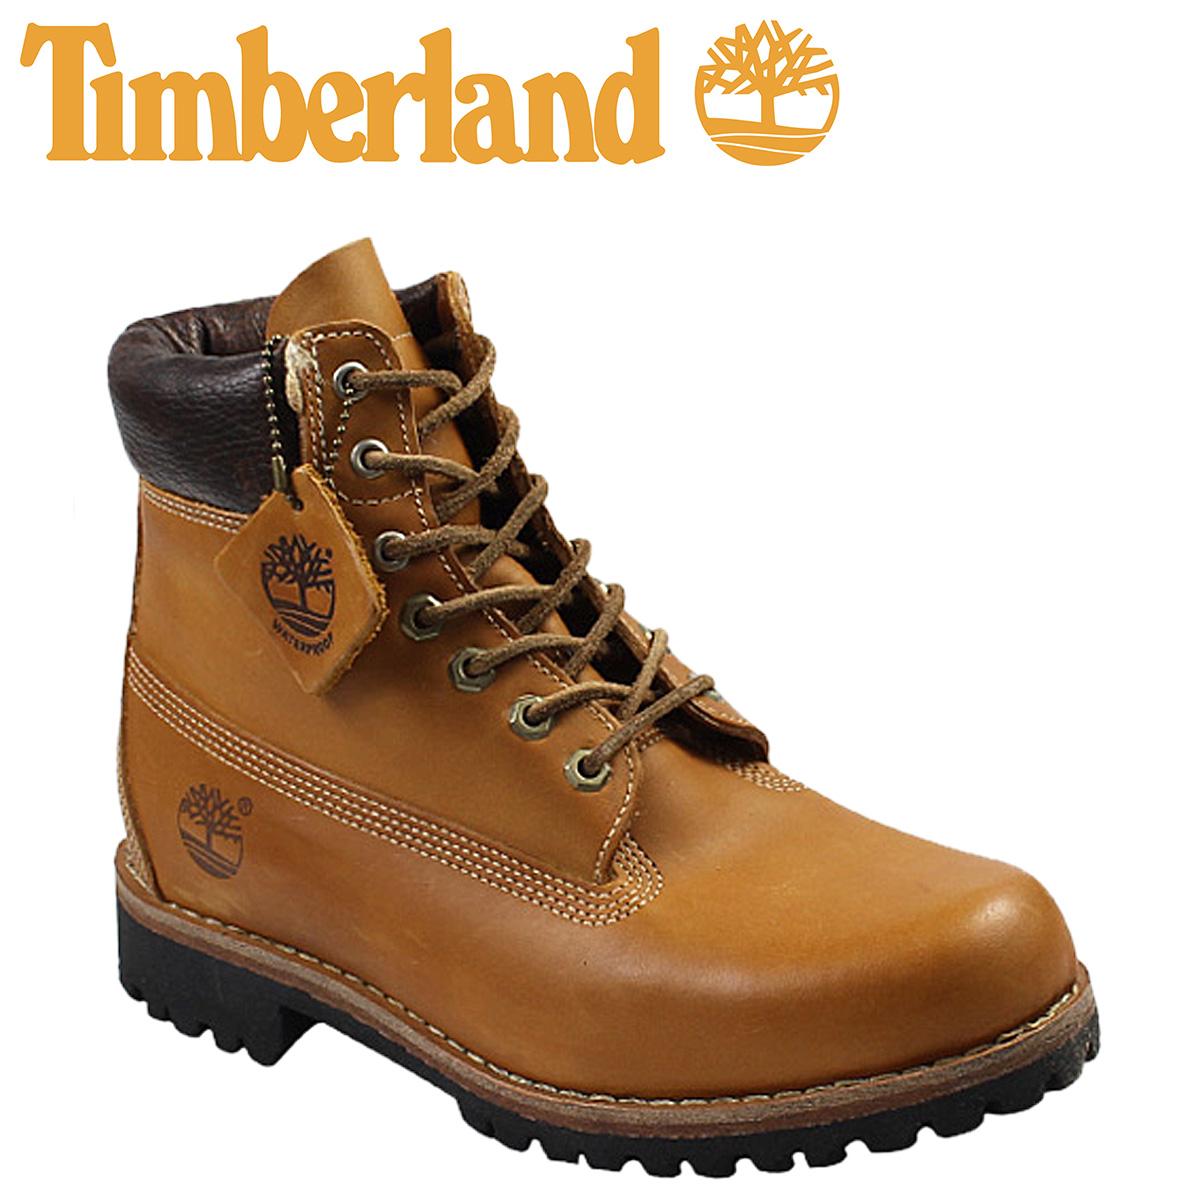 Allsports Timberland Boots